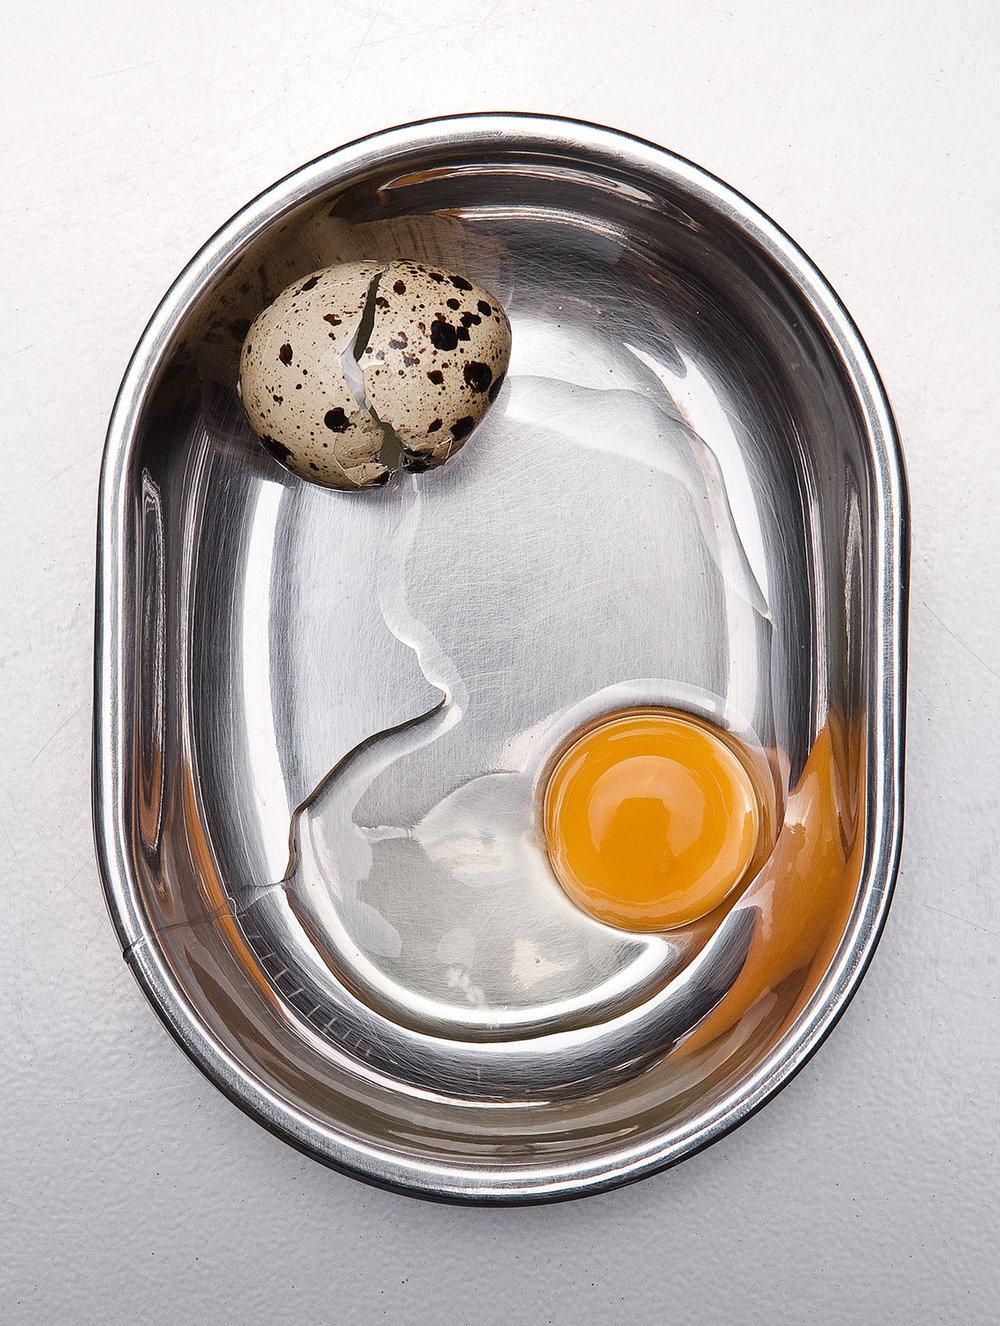 017-egg-dish.jpg